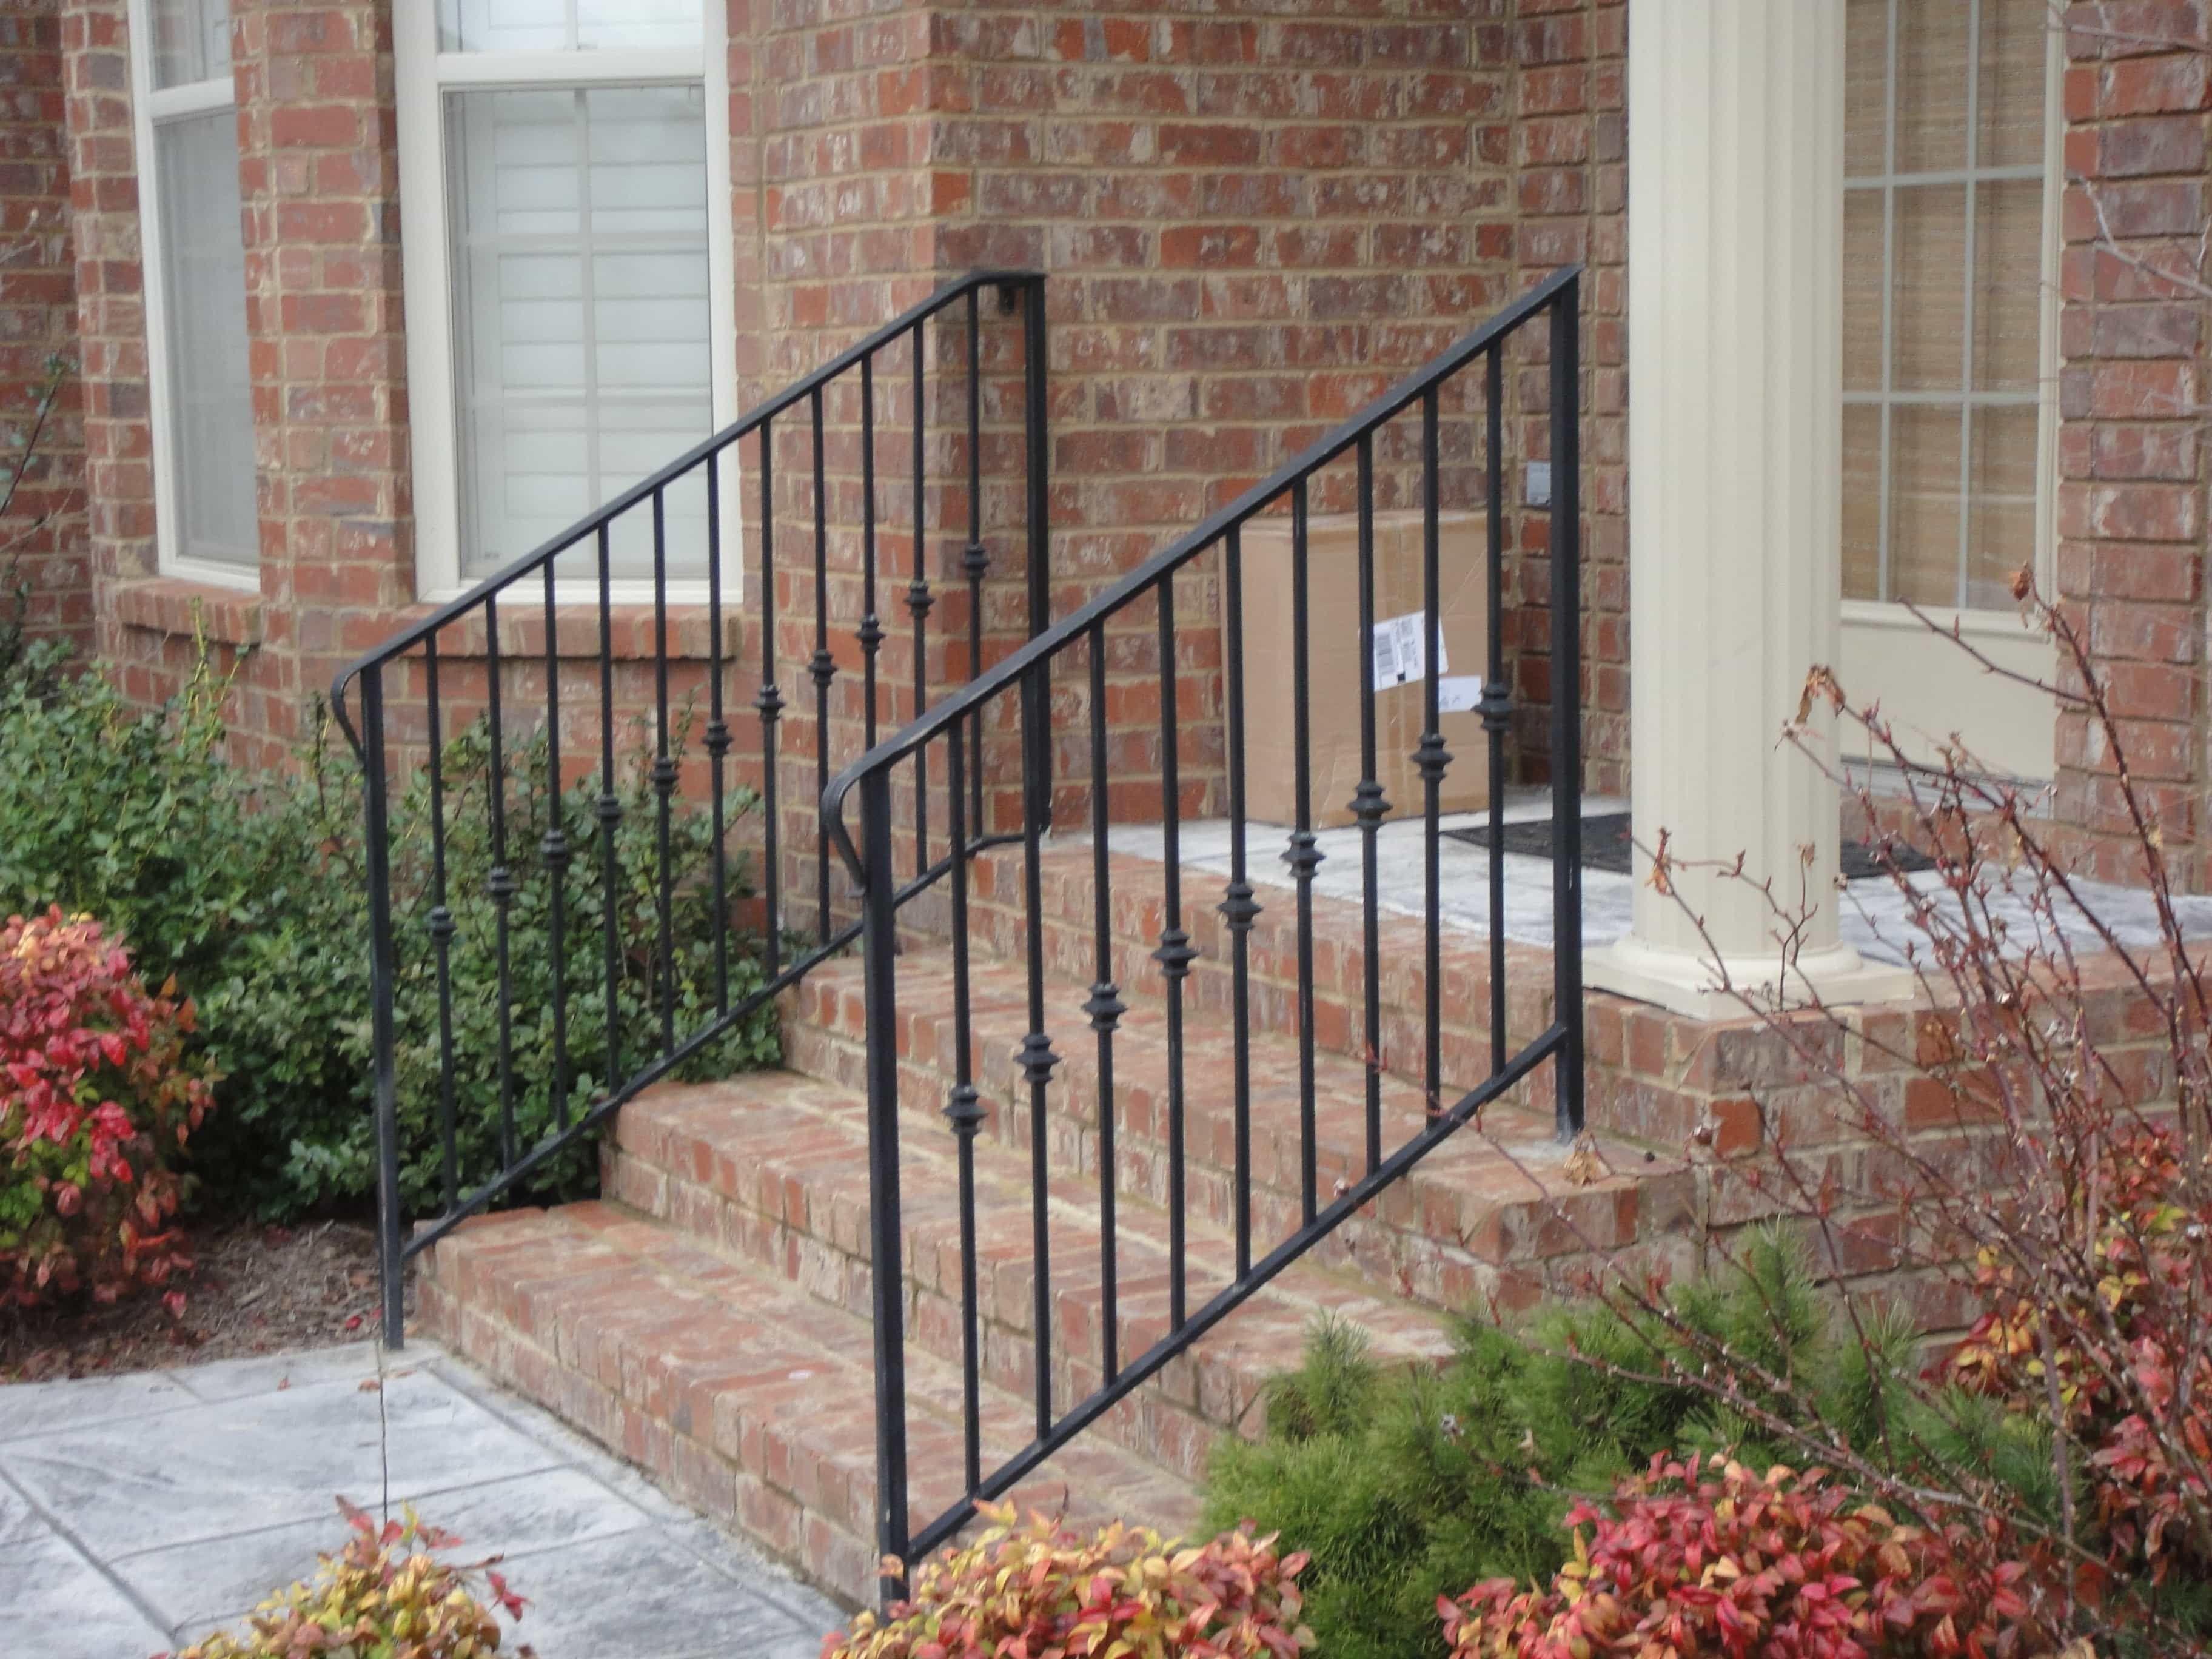 Grab Bars | Railing, Construction services, Outdoor decor